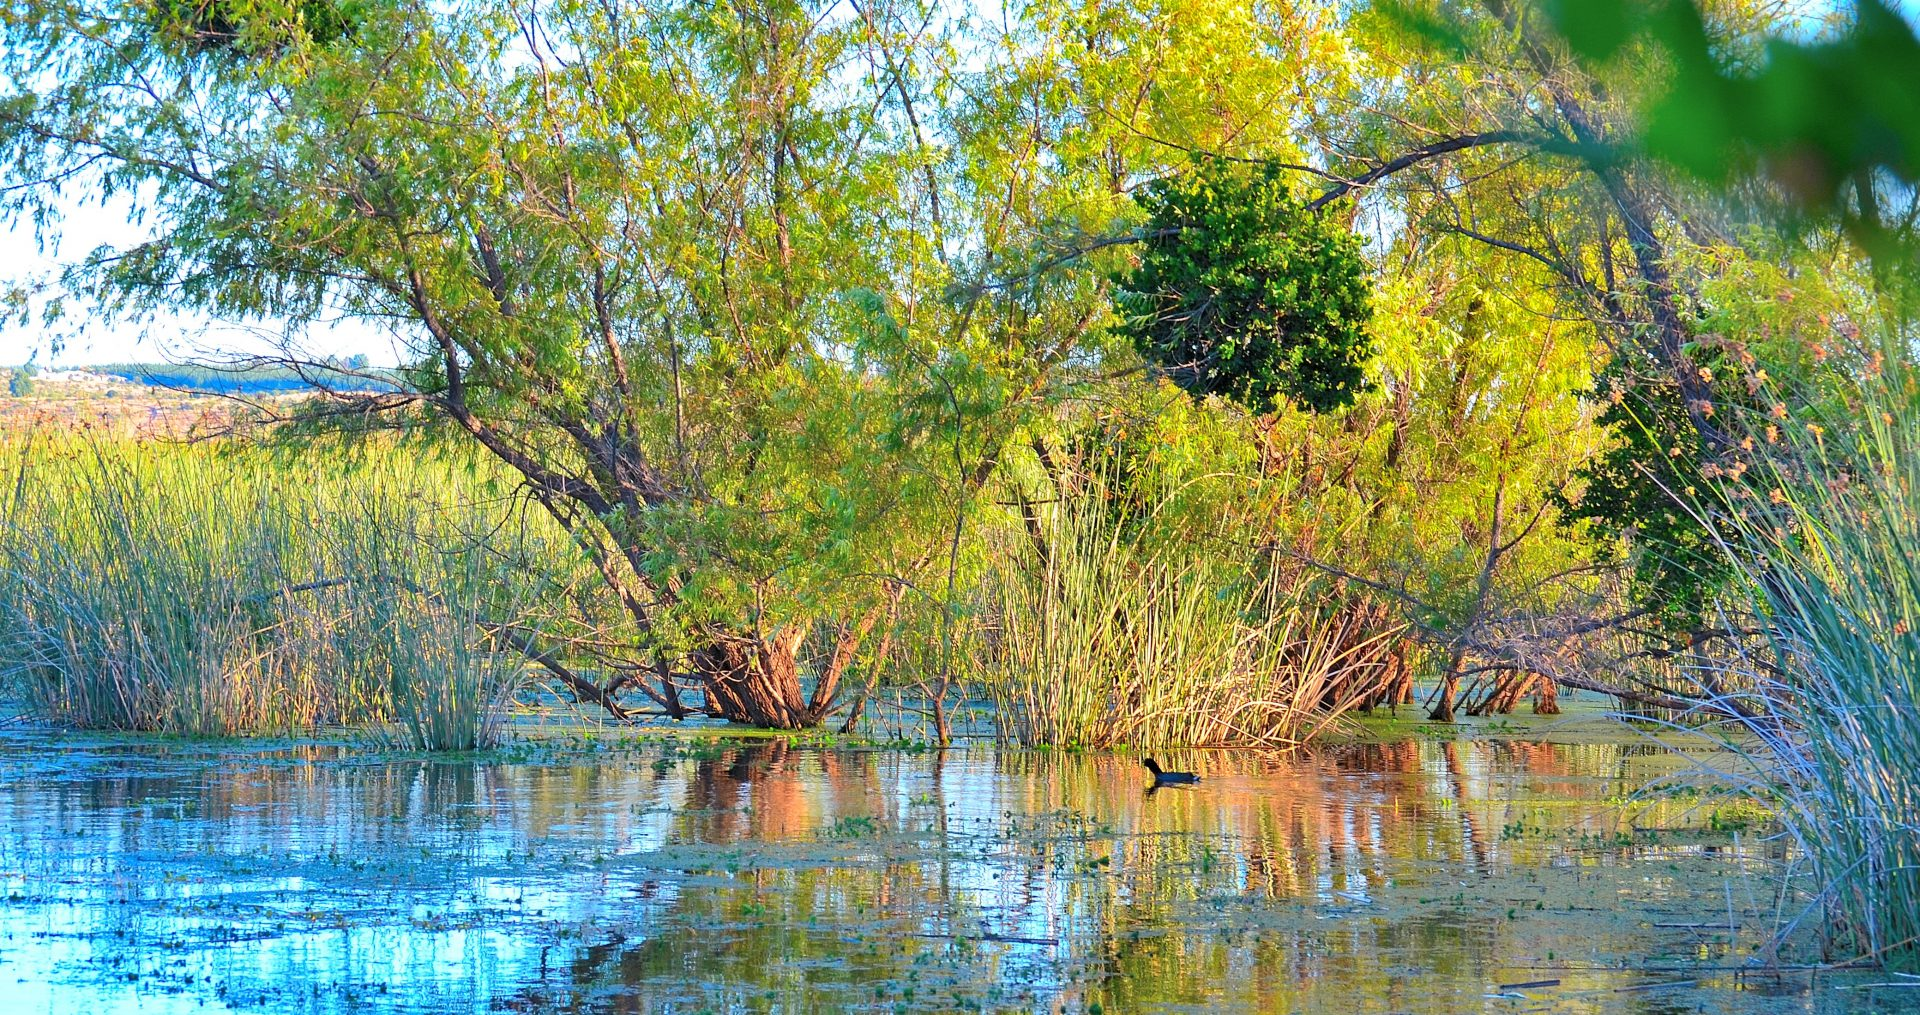 ecosistema hídrico